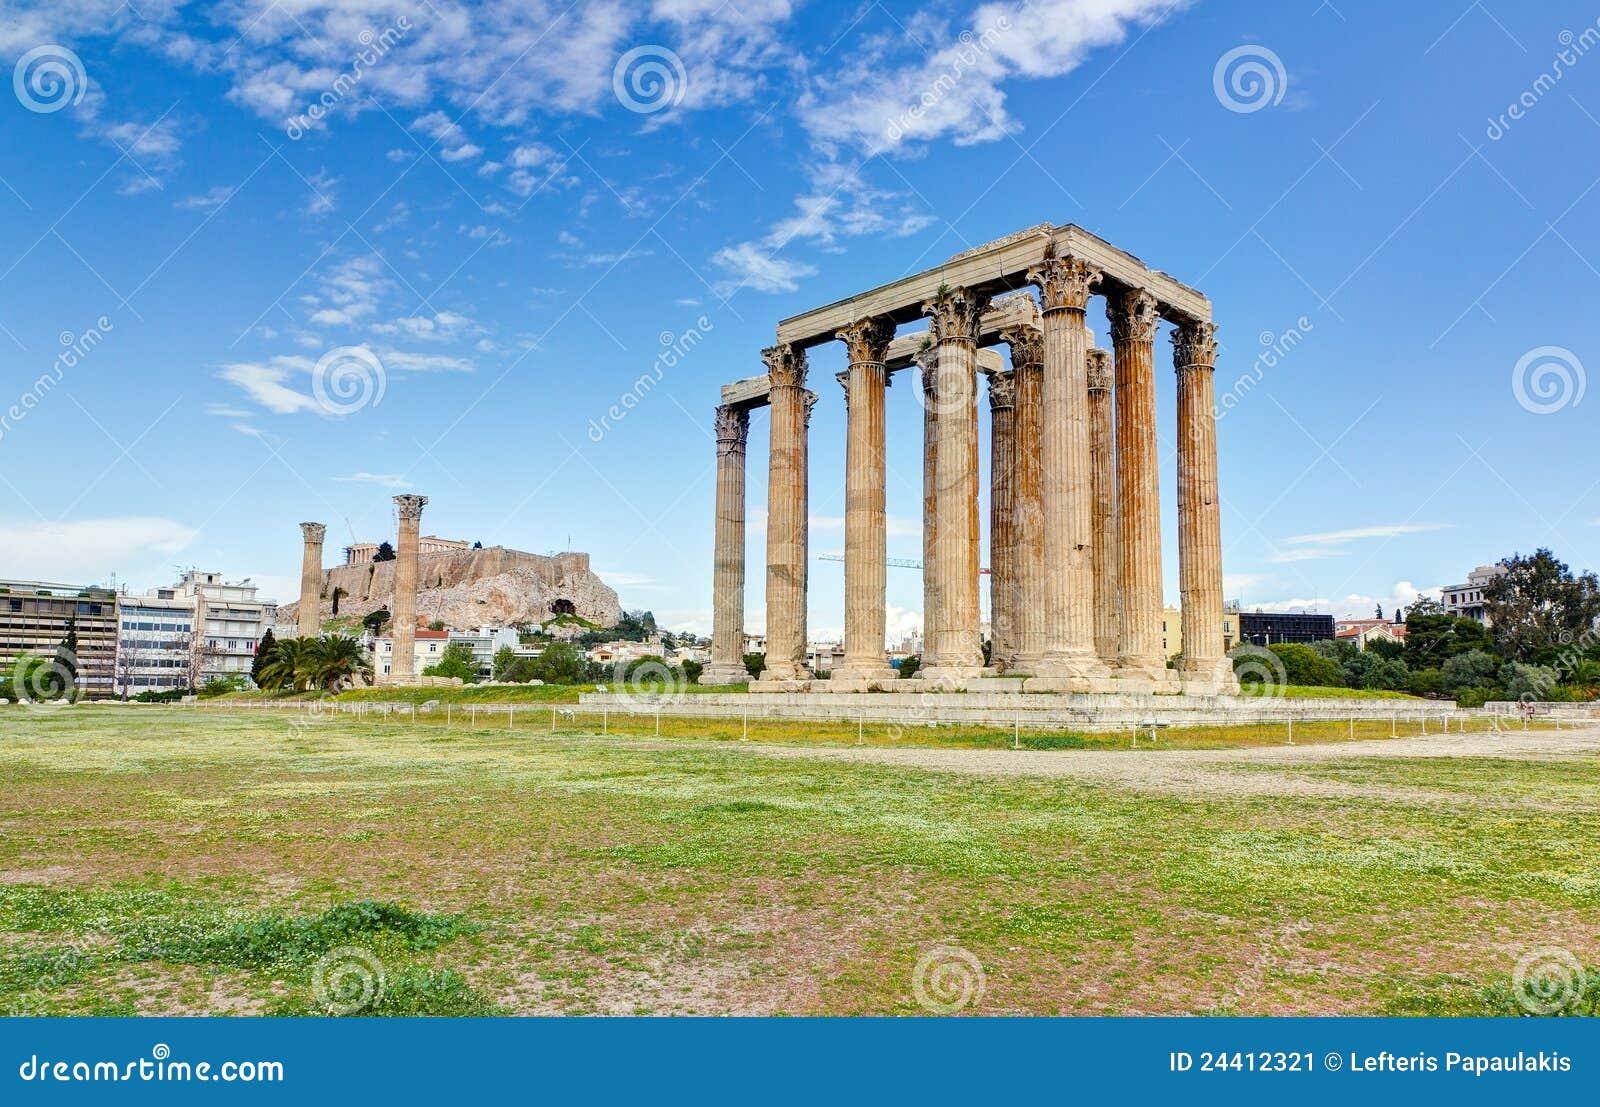 Temple of Olympian Zeus, Acropolis in background